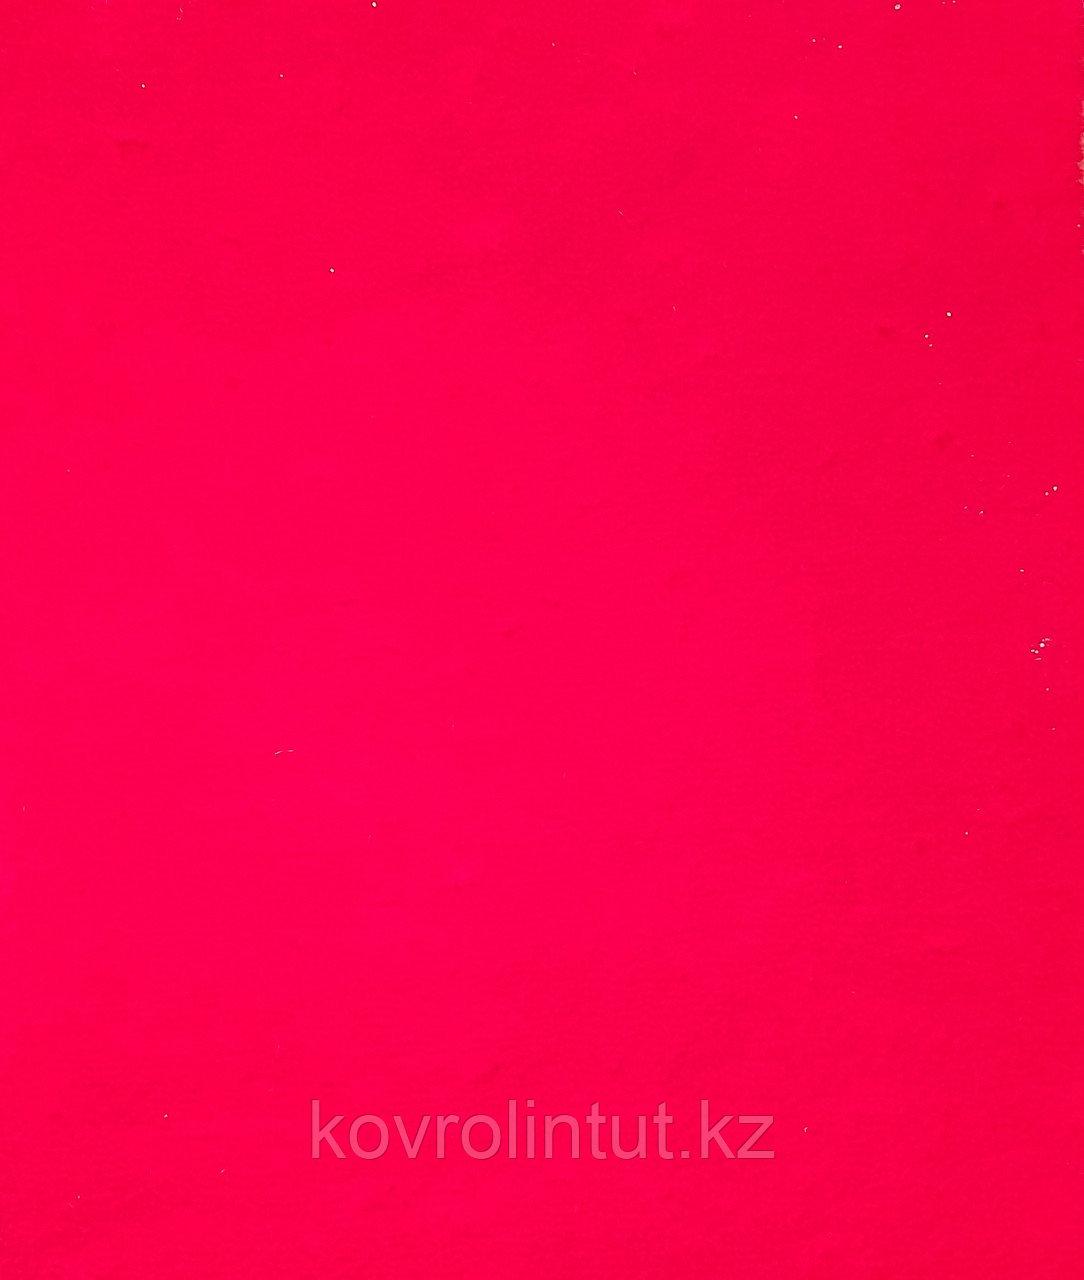 Ковролин (ковролан) Украина Boston Heat Set  100% PP  25100210 Алый  4,0м опт/розн.